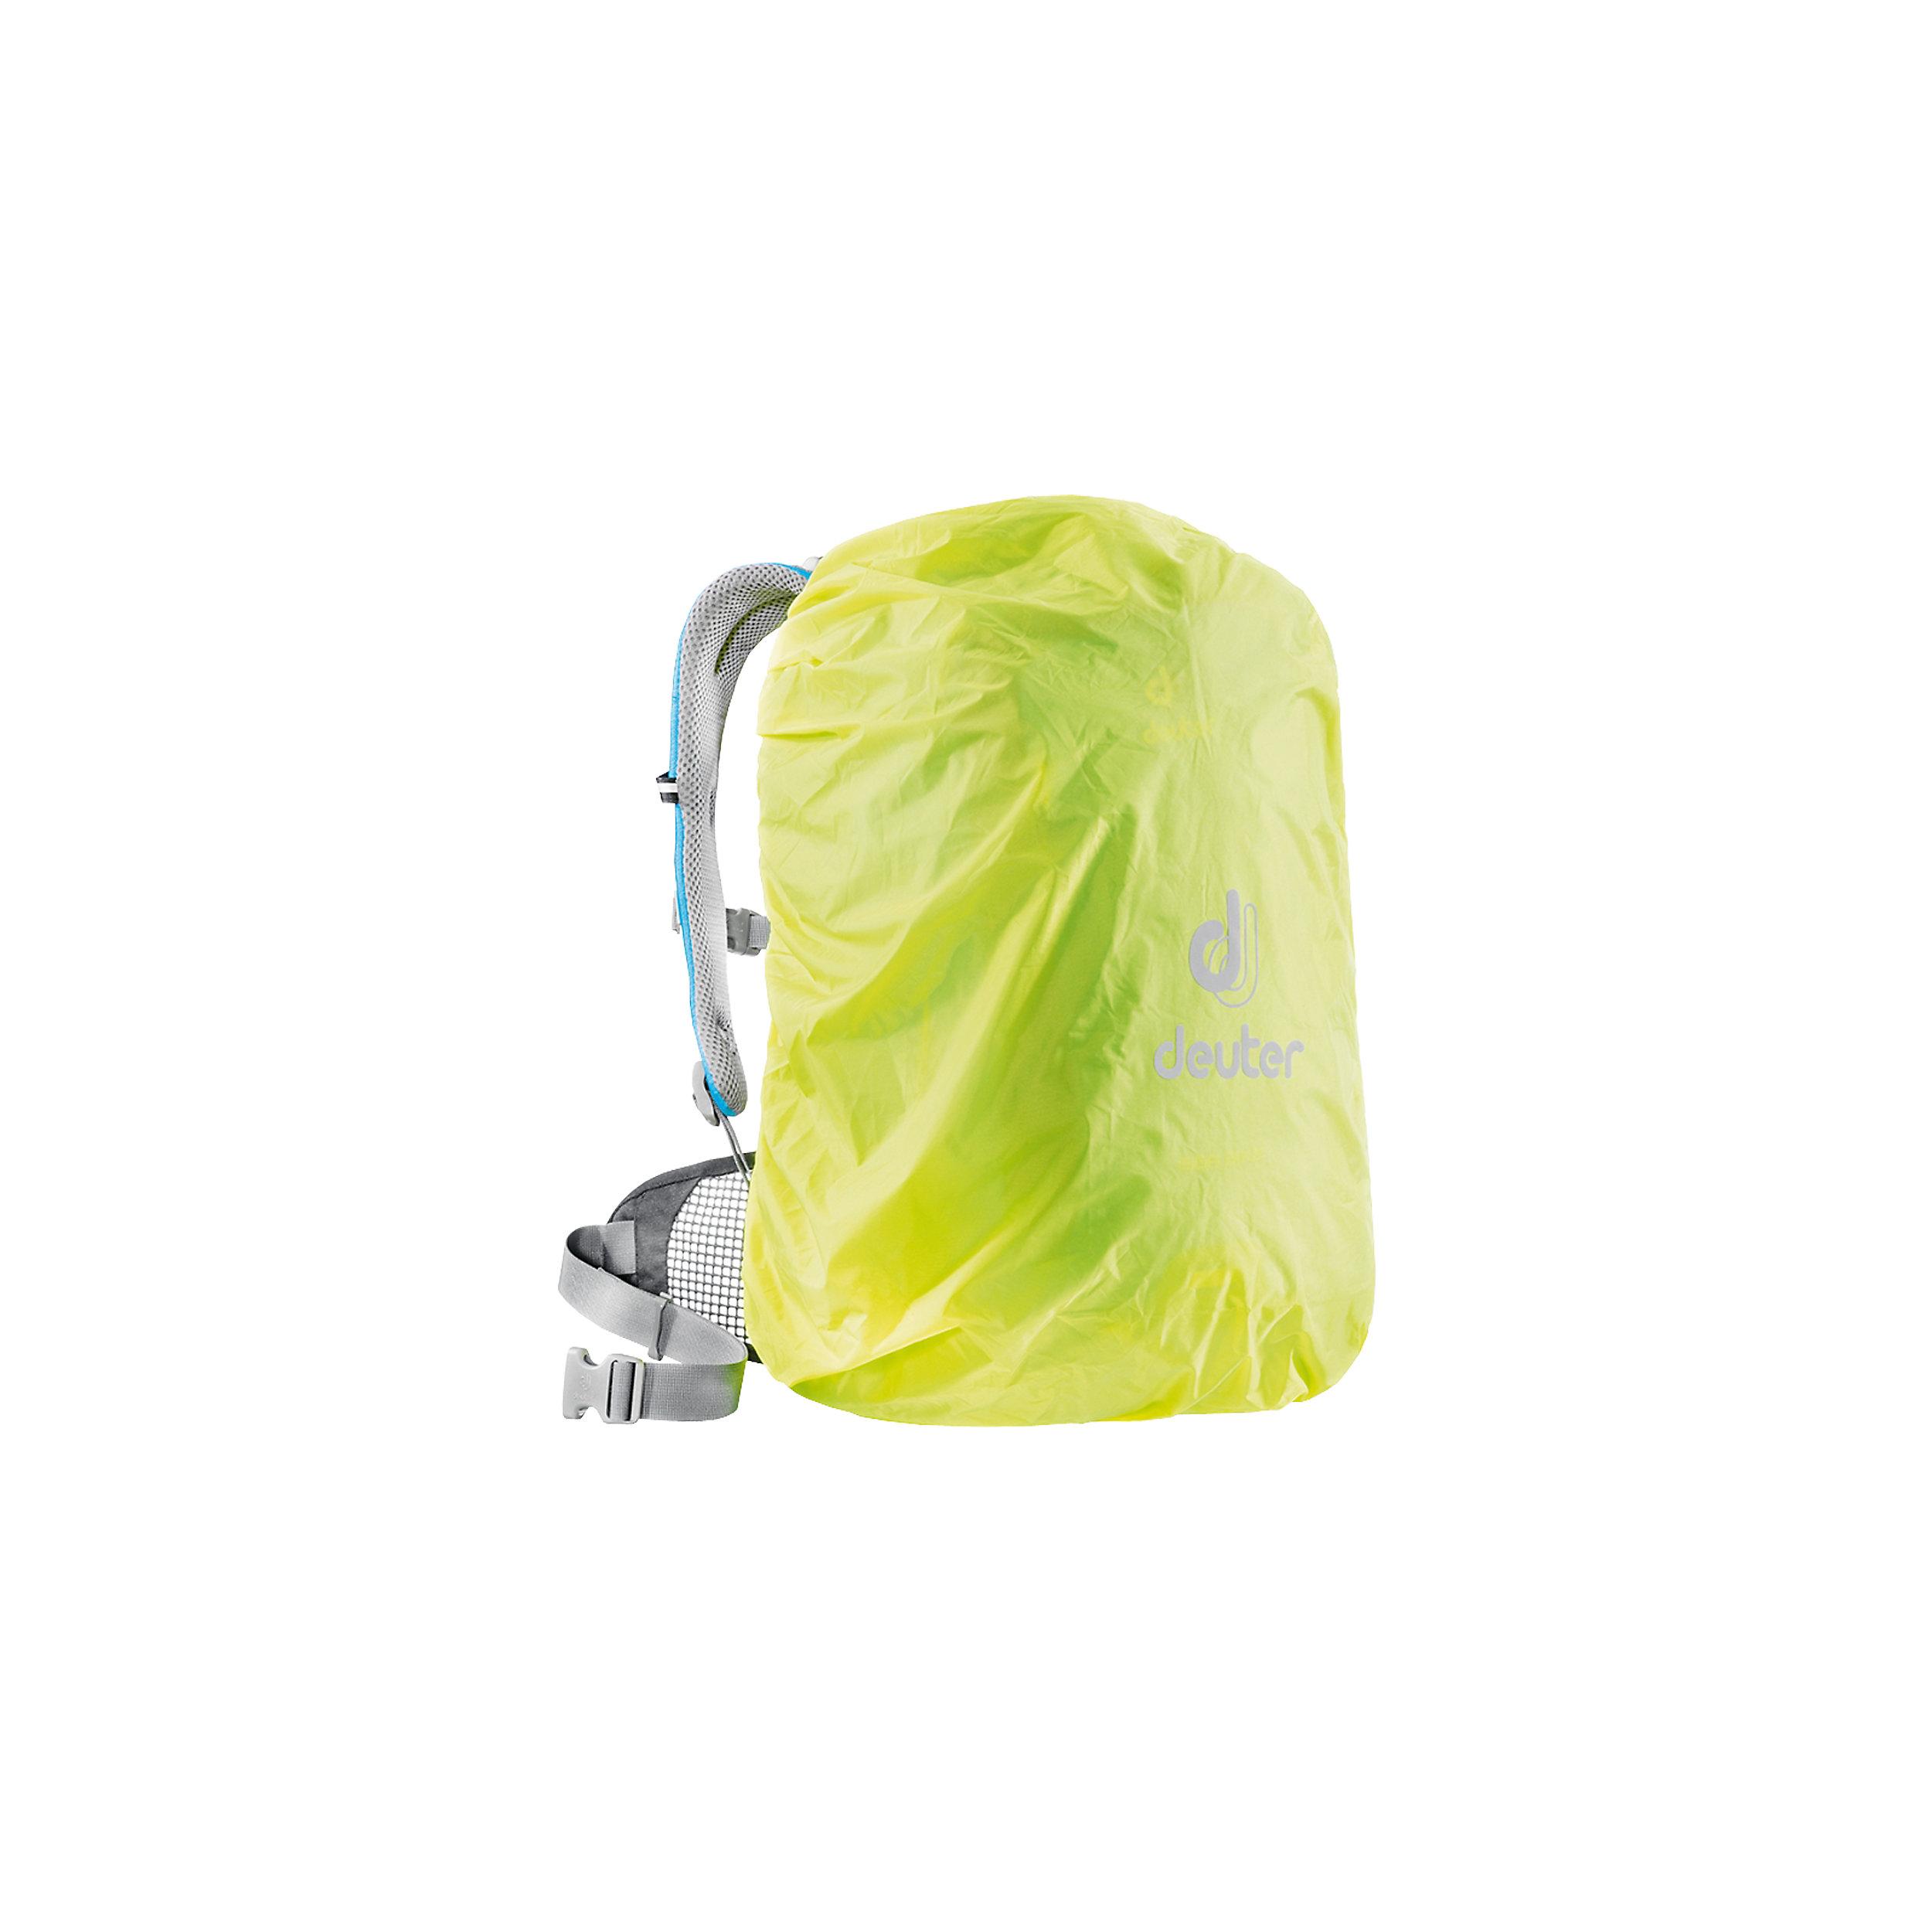 Rucksack-Regenhülle Rain Cover Square Accessoires 32 Liter